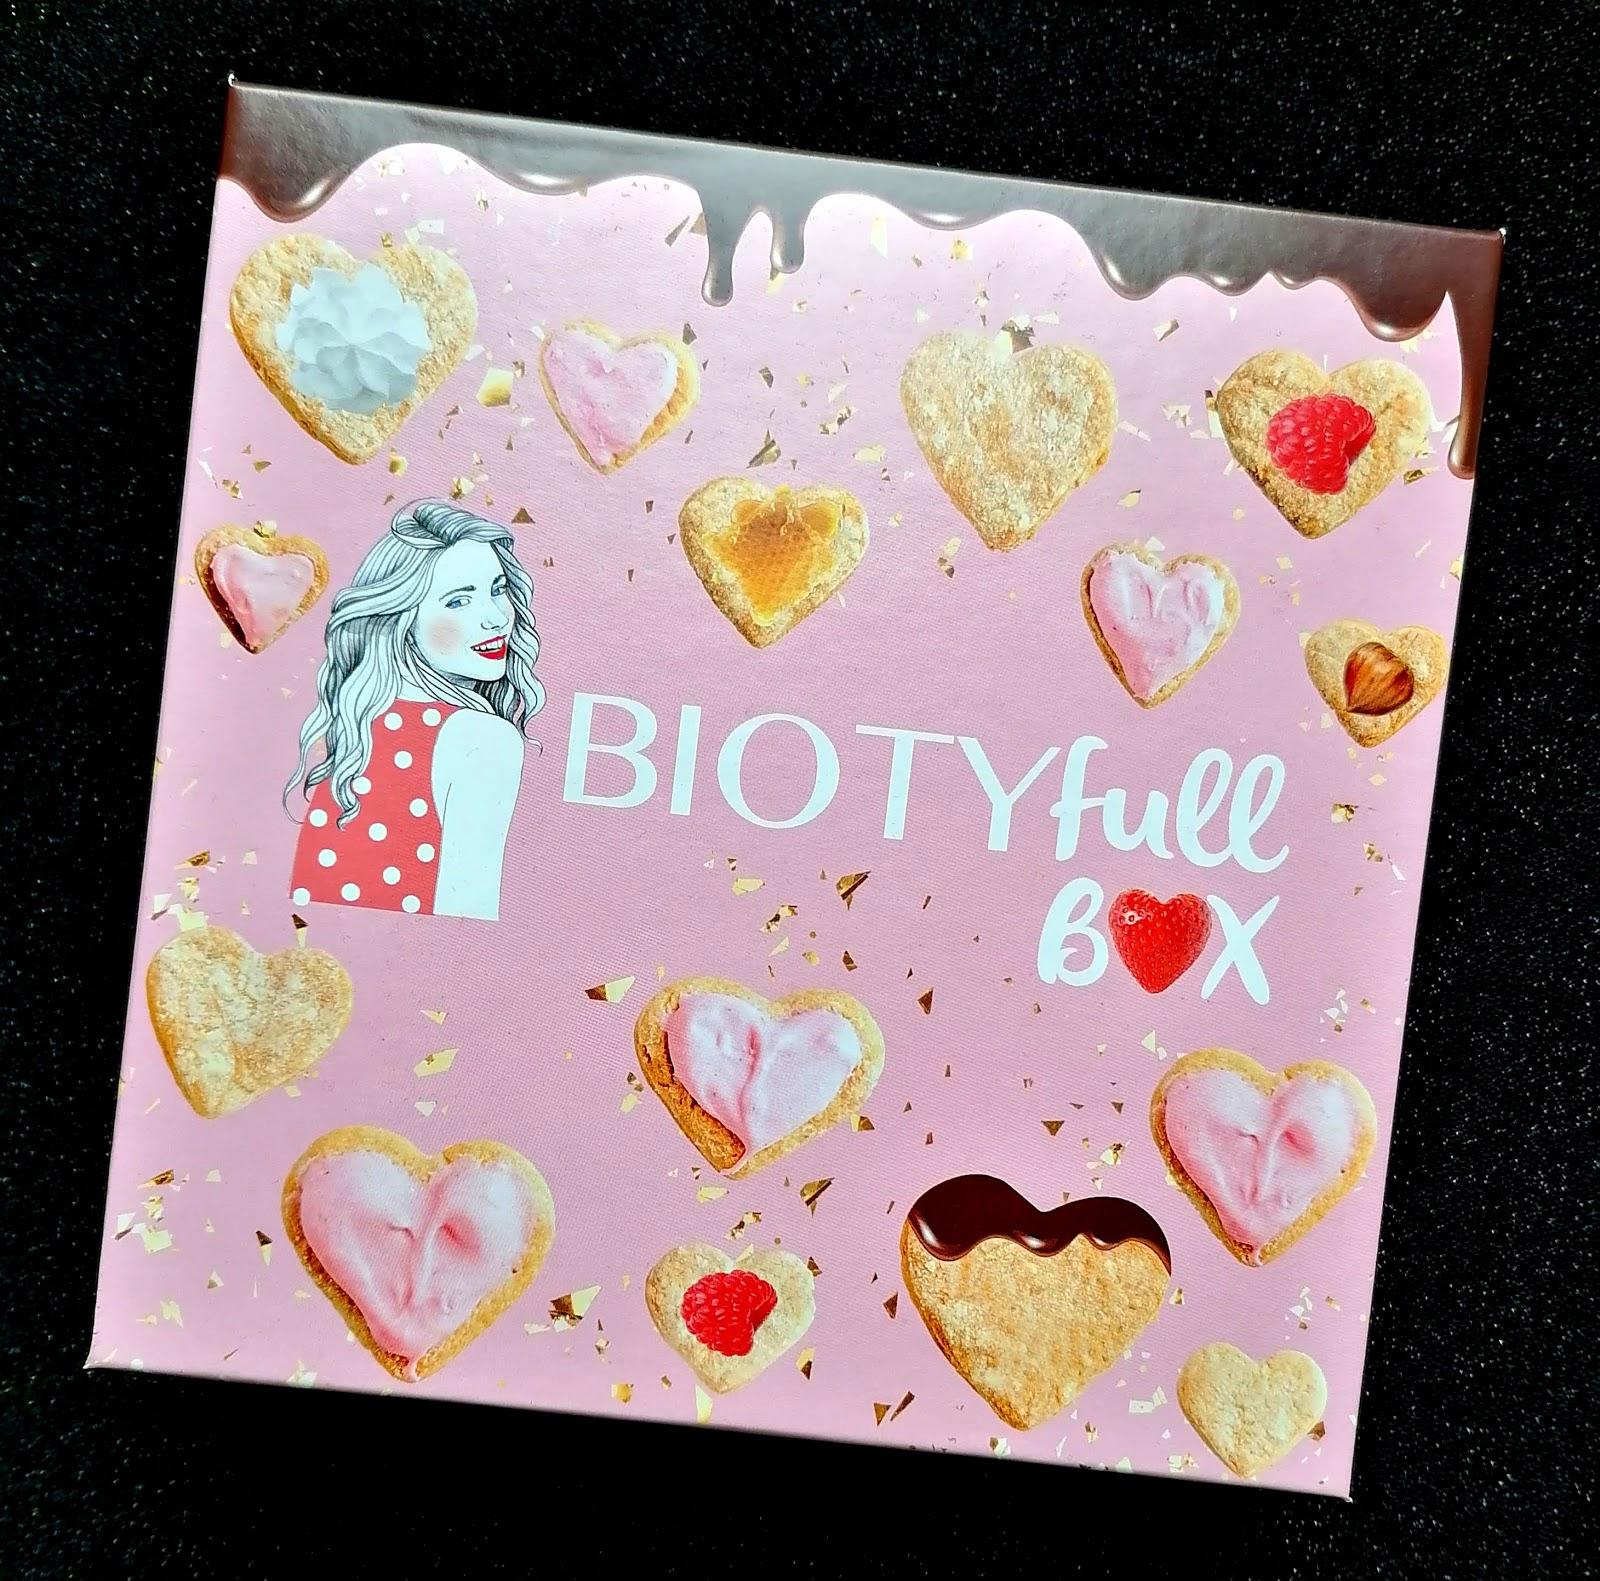 BIOTYFULL BOX Février 2020 > La Gourmande!